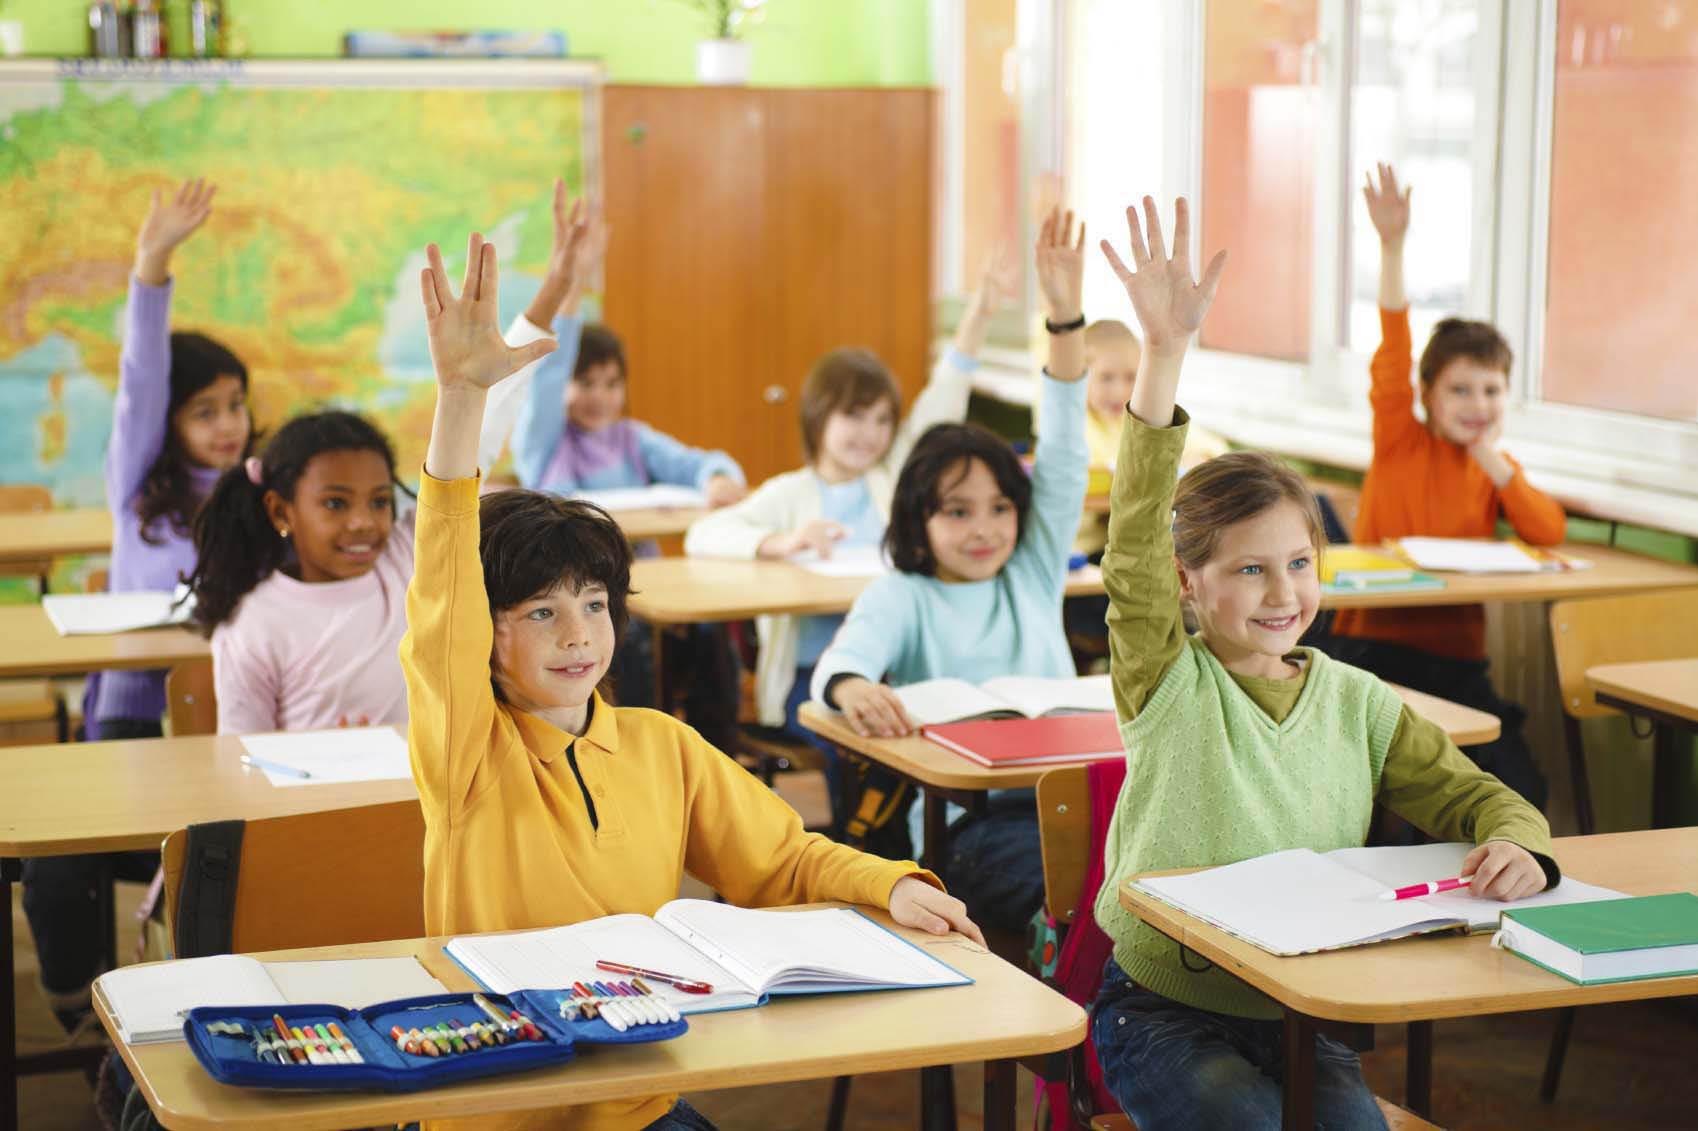 Big class sizes reduce the efficacy of tutoring near Cypress